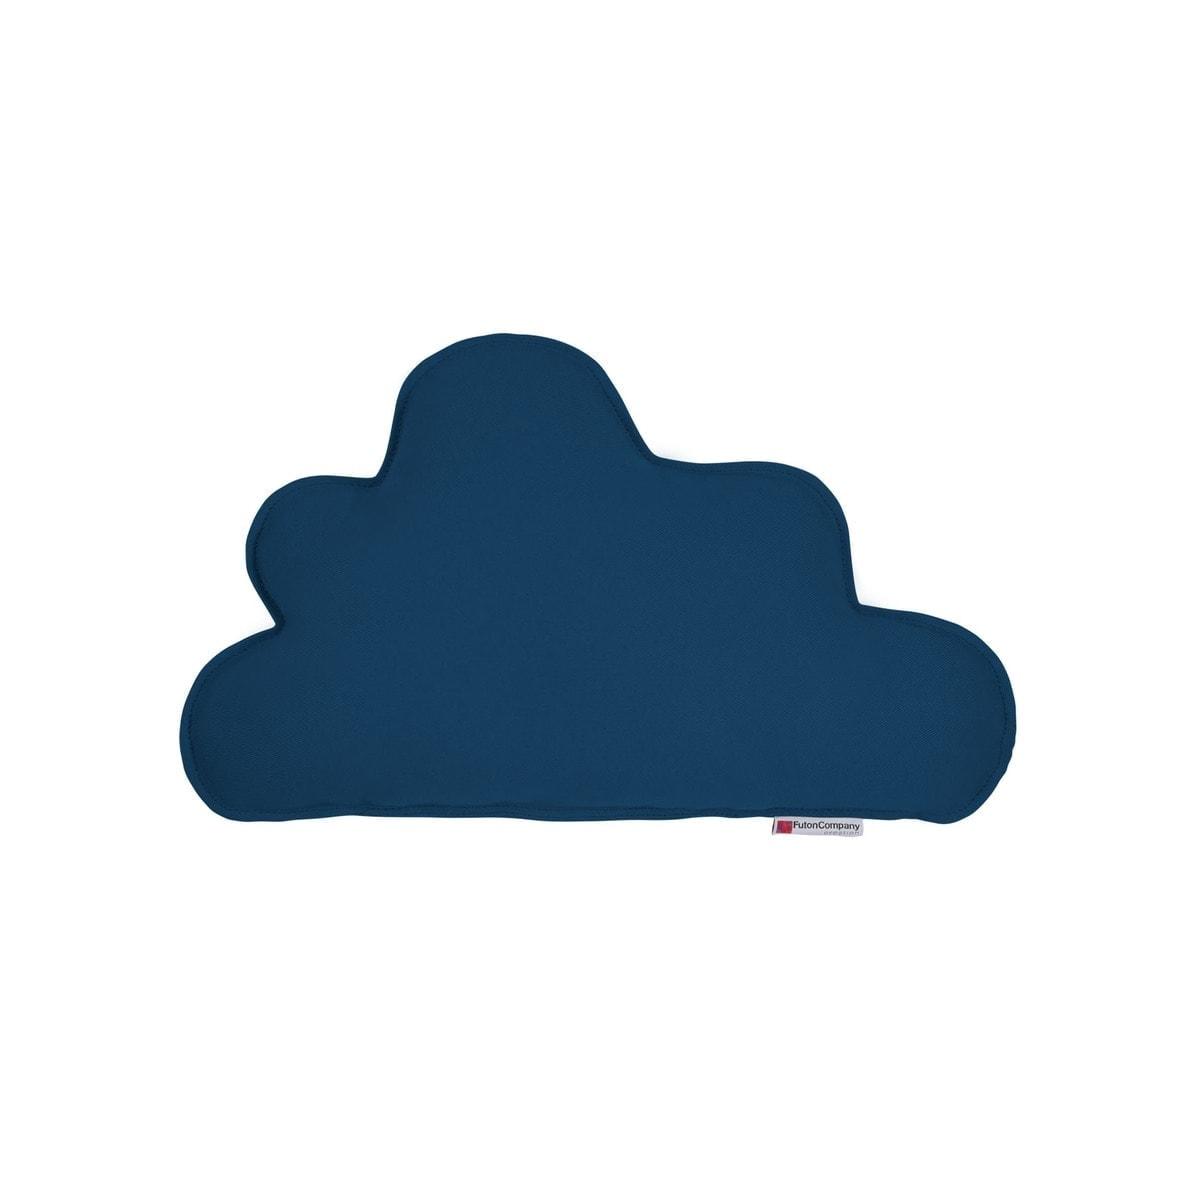 Almofada-Nuvem-Sharp-M-Tecido-Sarja-Azul-Marinho-01